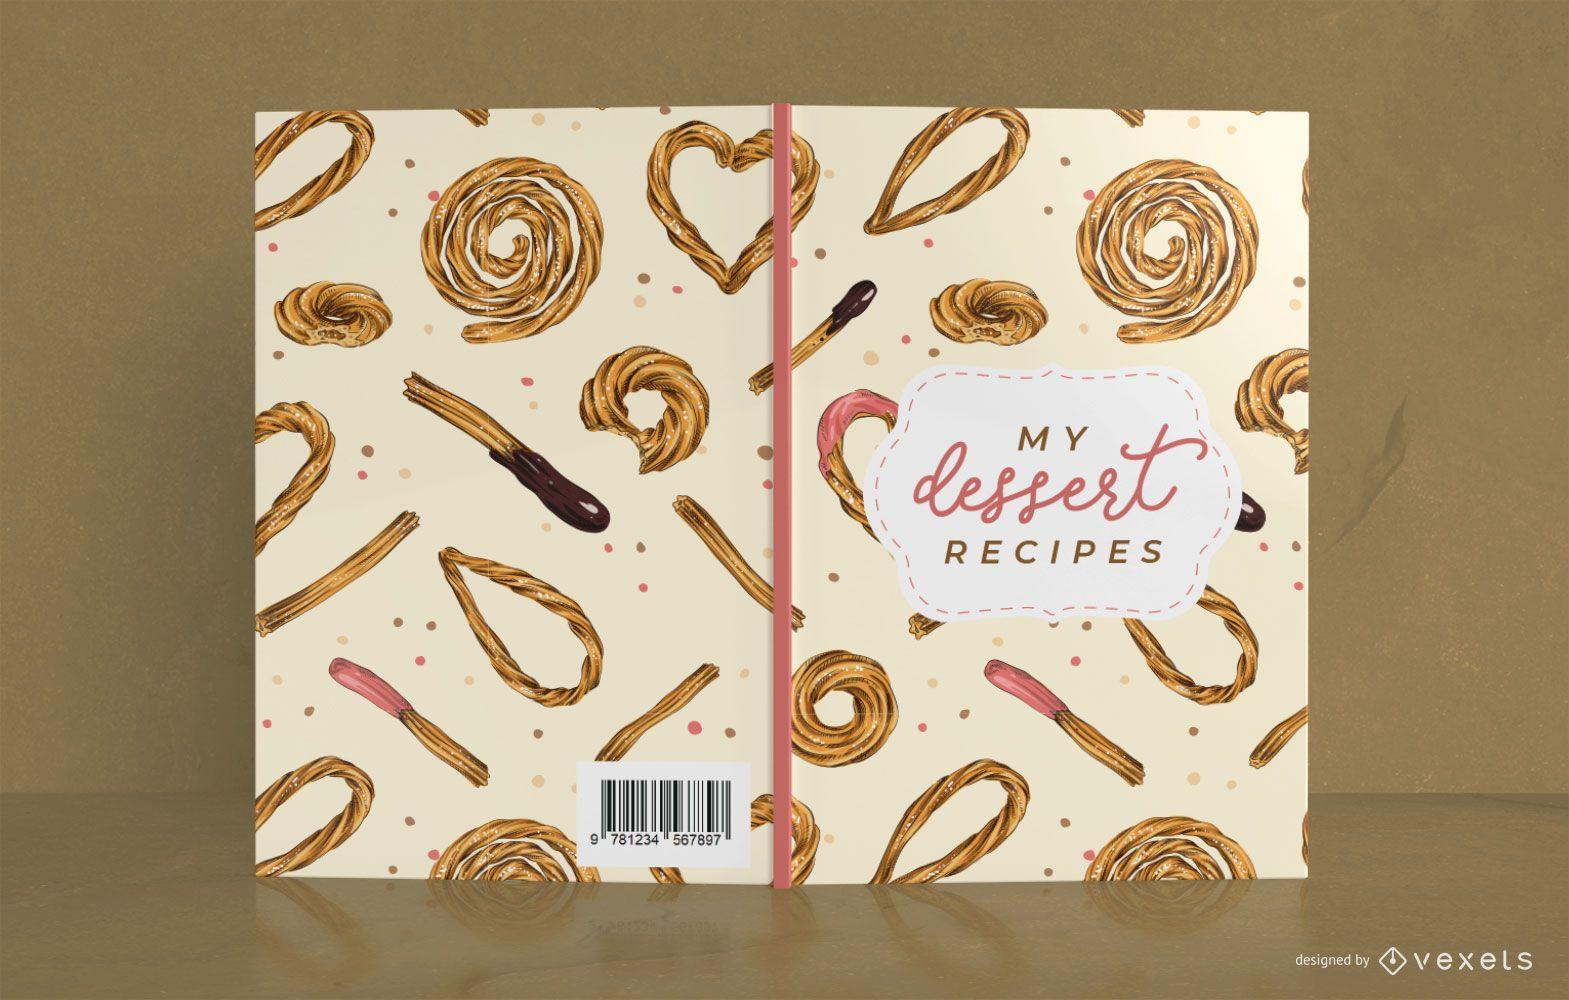 Dessert Recipe Book Cover Design